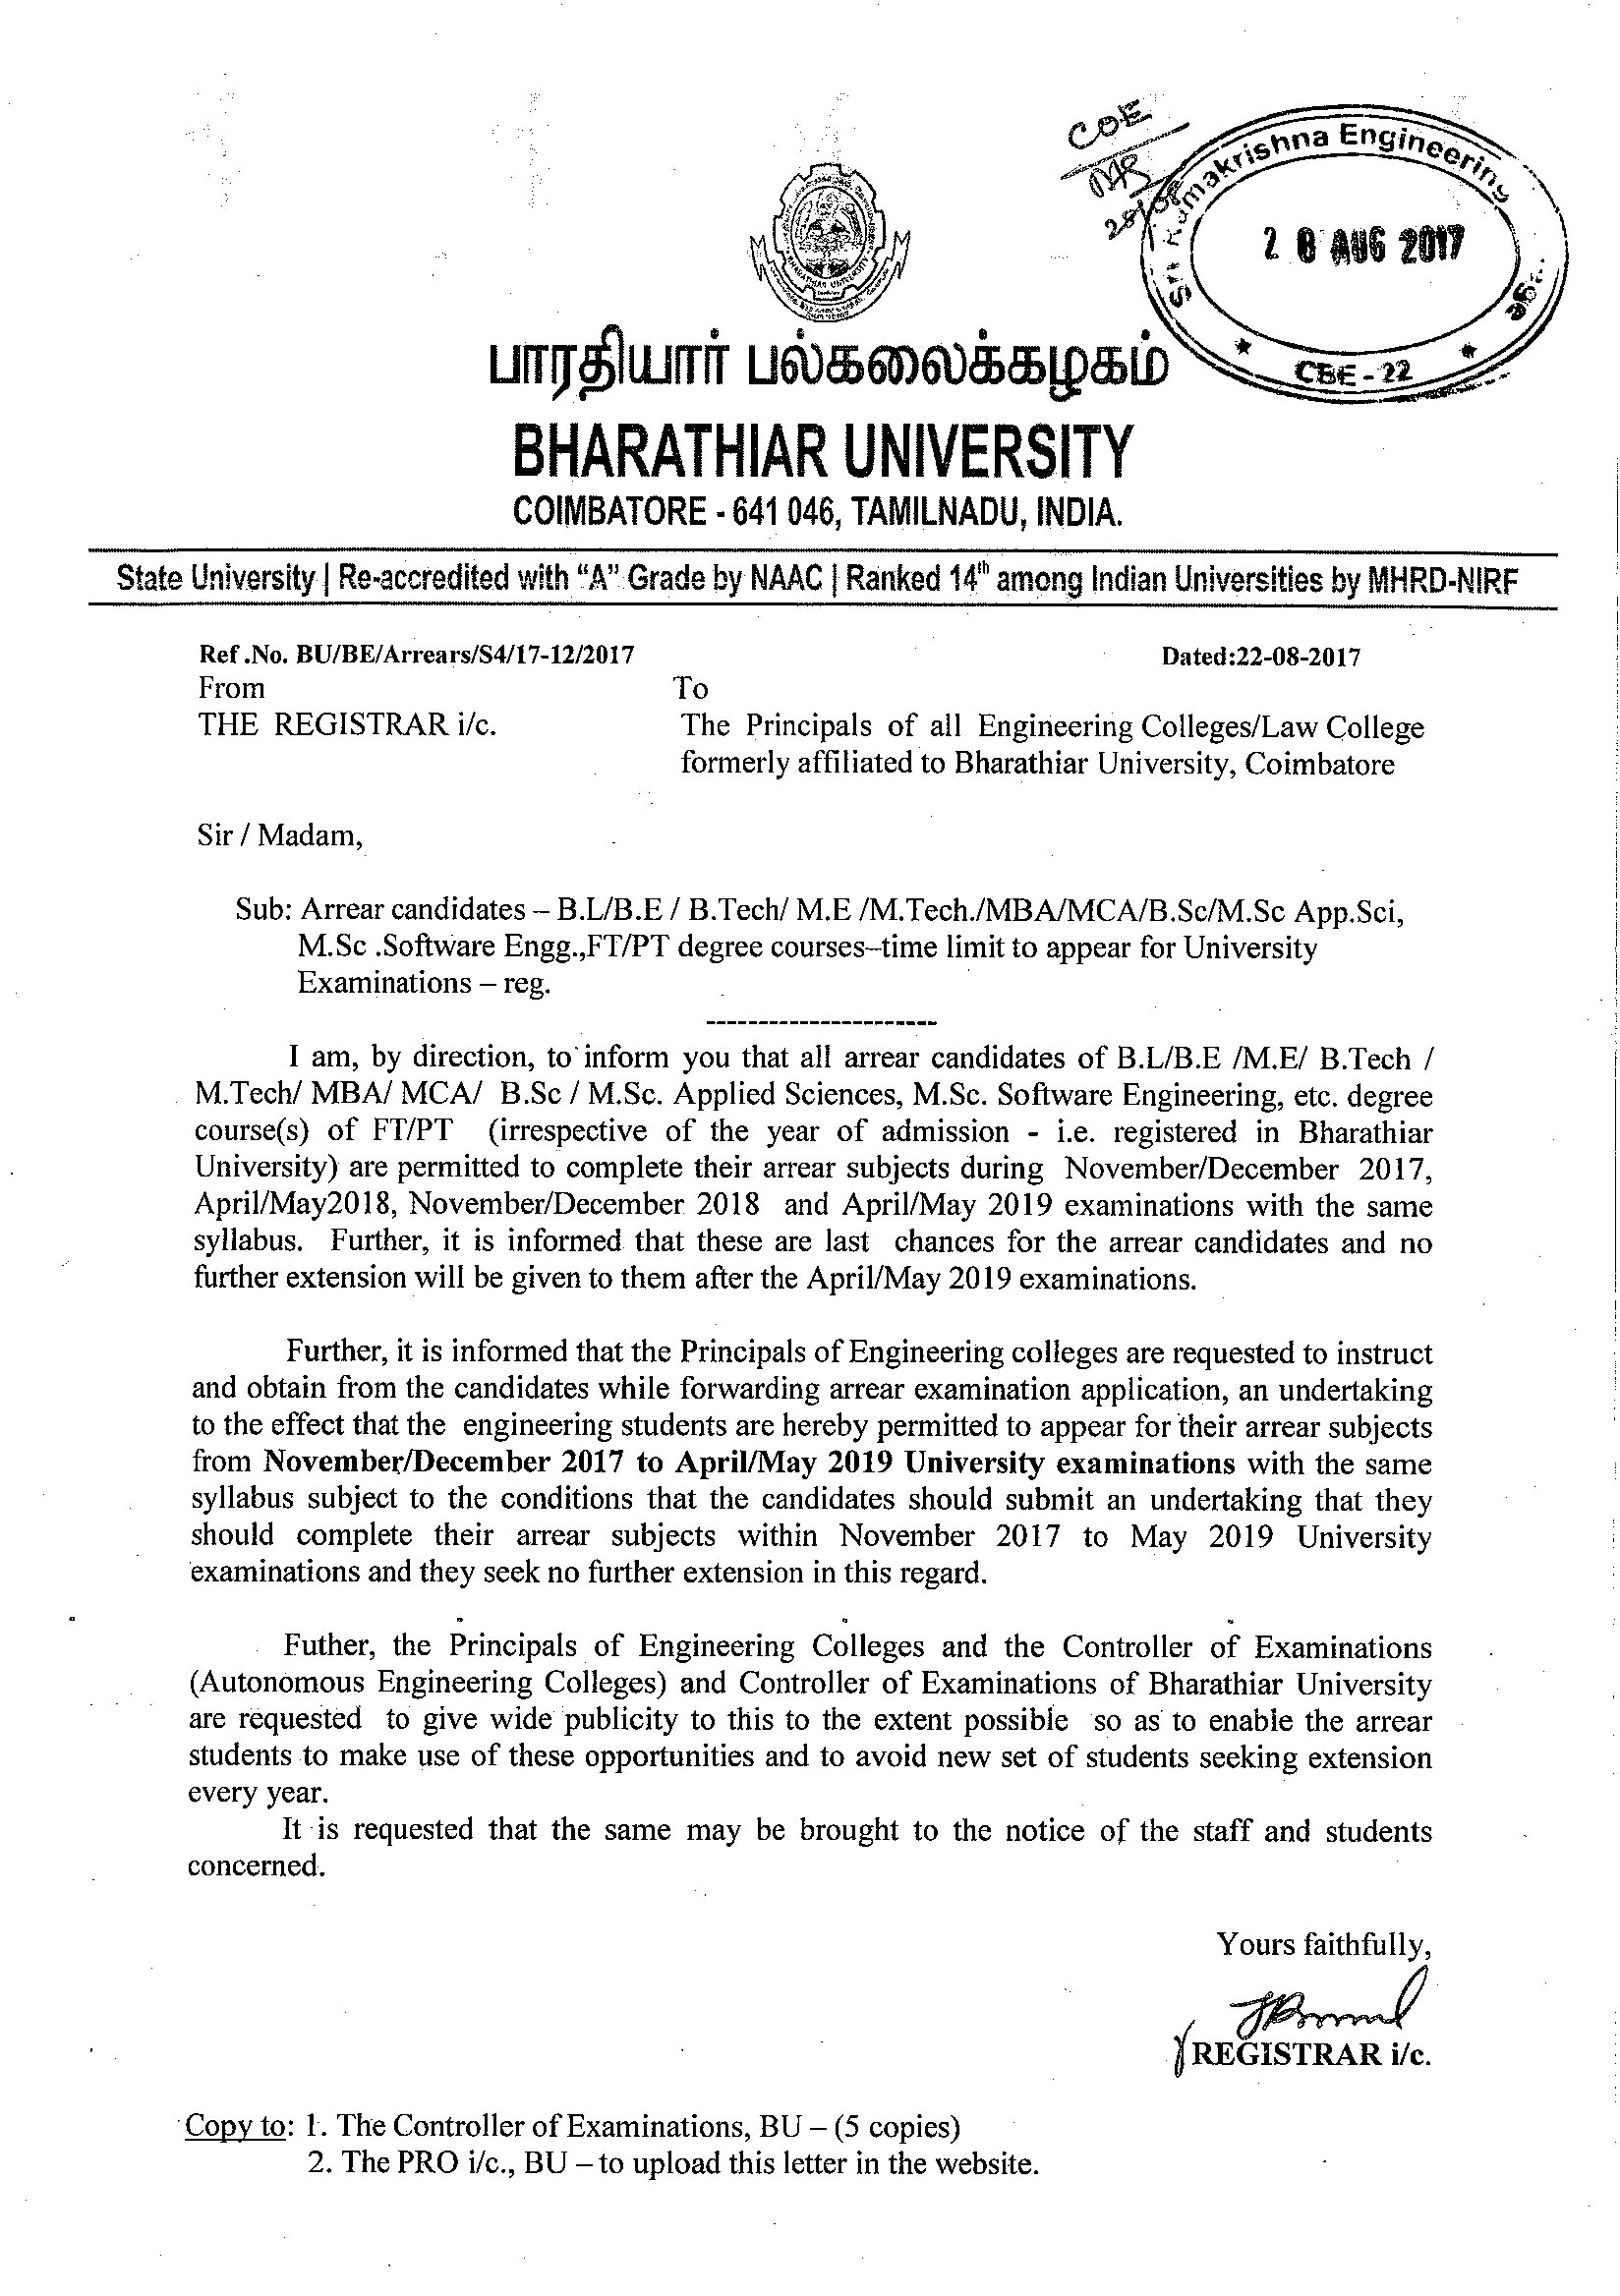 Extension of kind for candidates under Bharathiar University